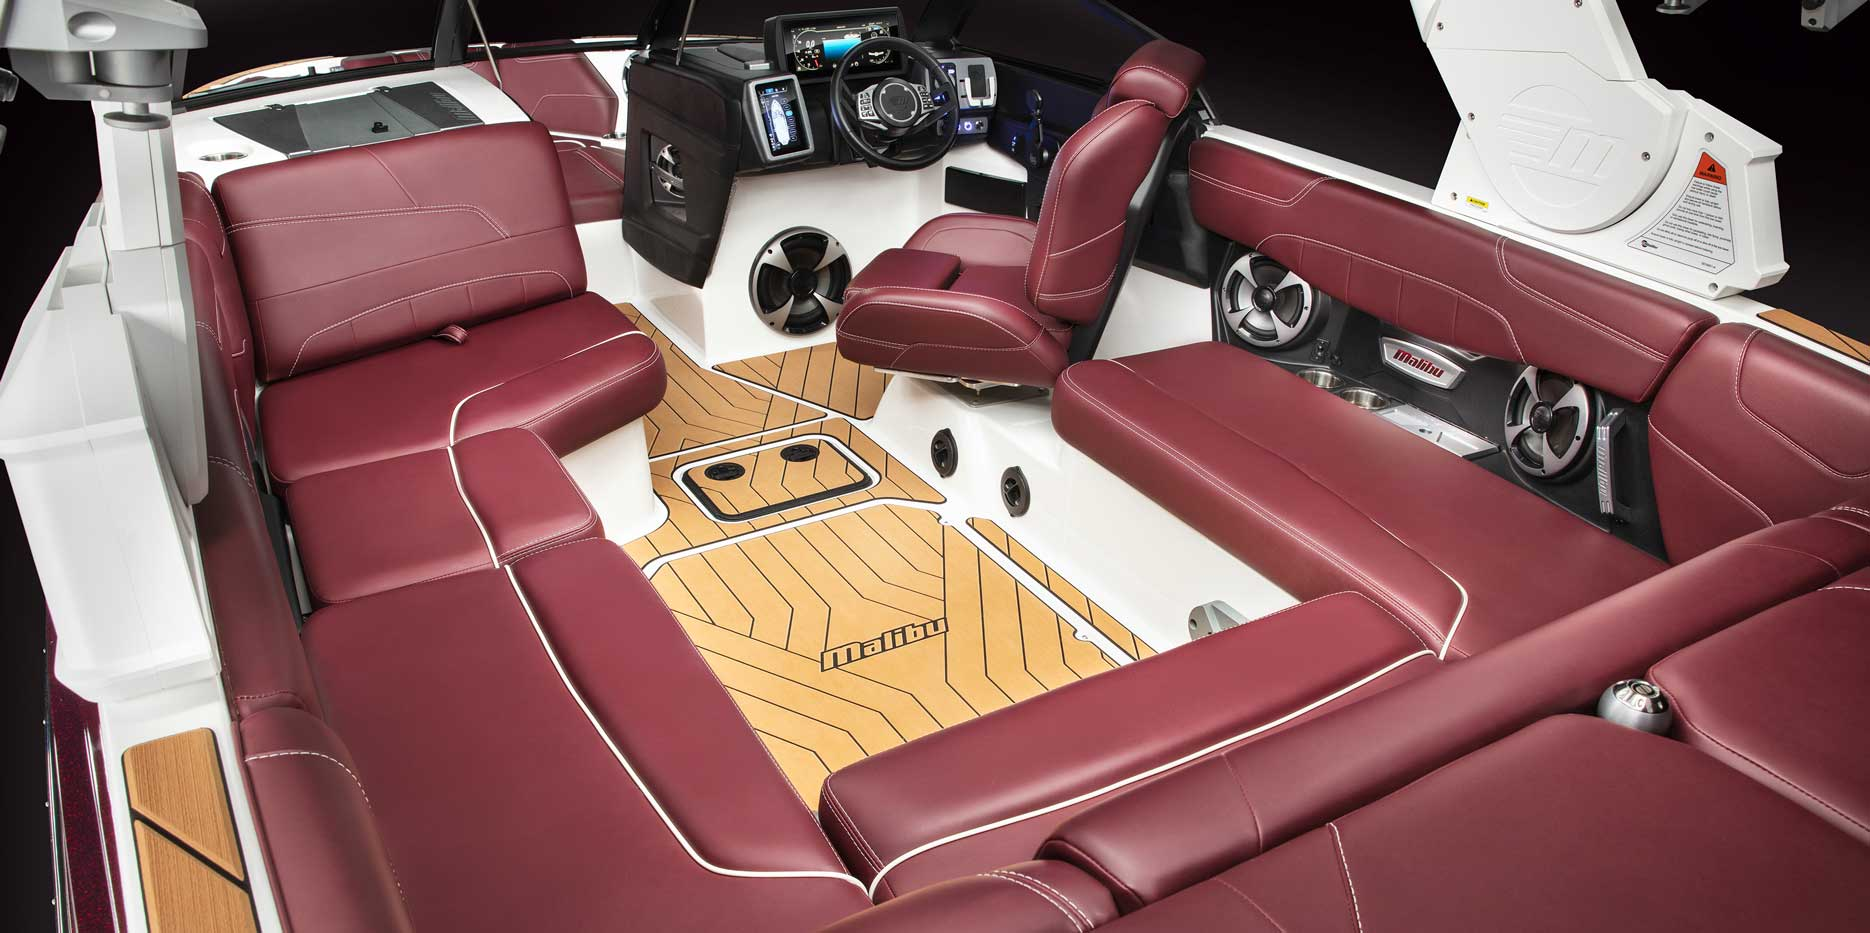 Custom Malibu soft grip styling inside of the 22 LSV.